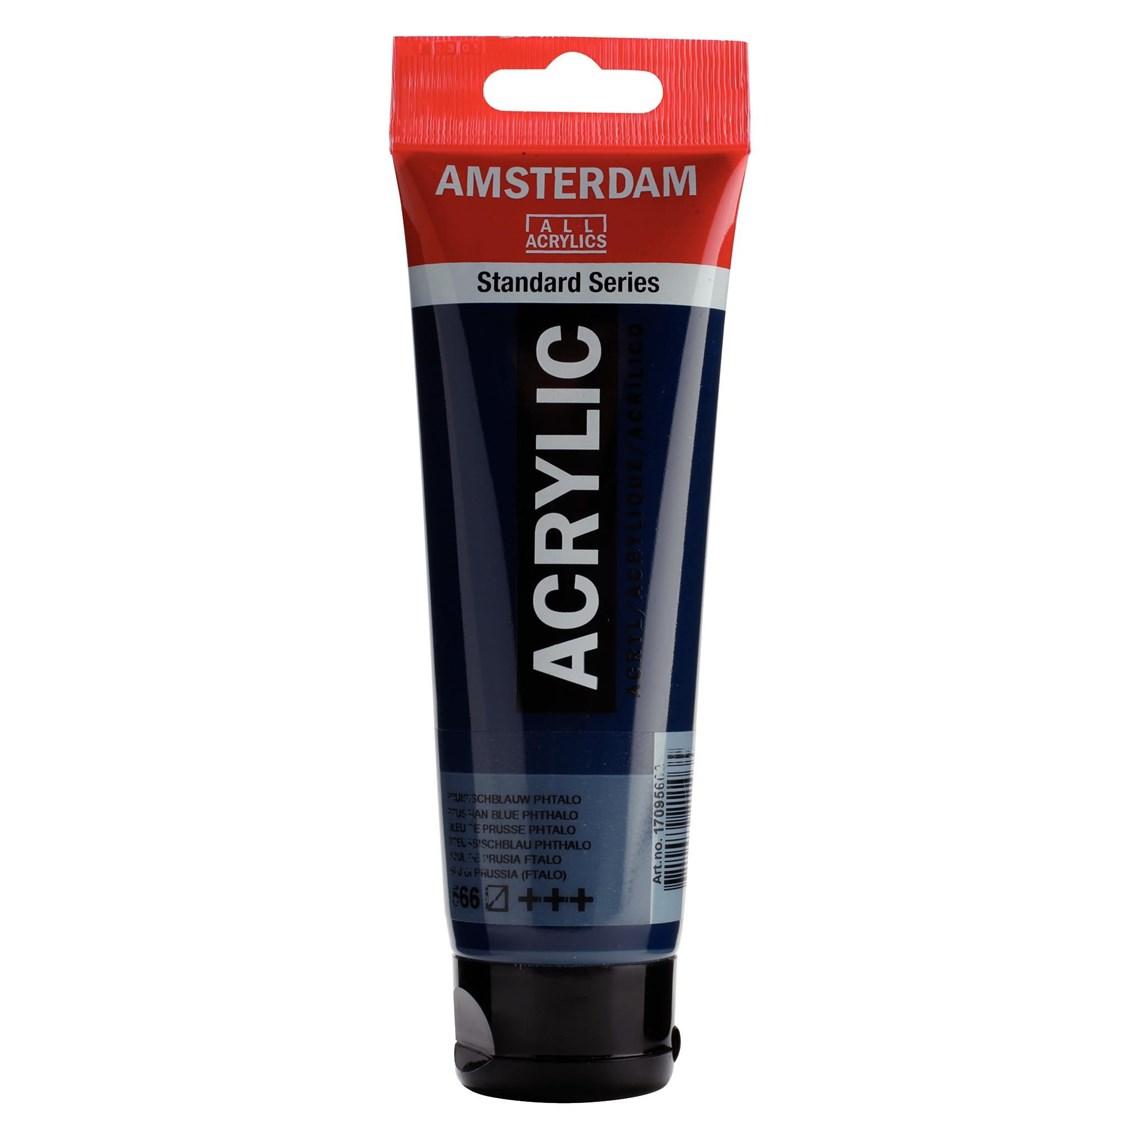 Amsterdam acrylverf Pruisischblauw (phtalo) 566